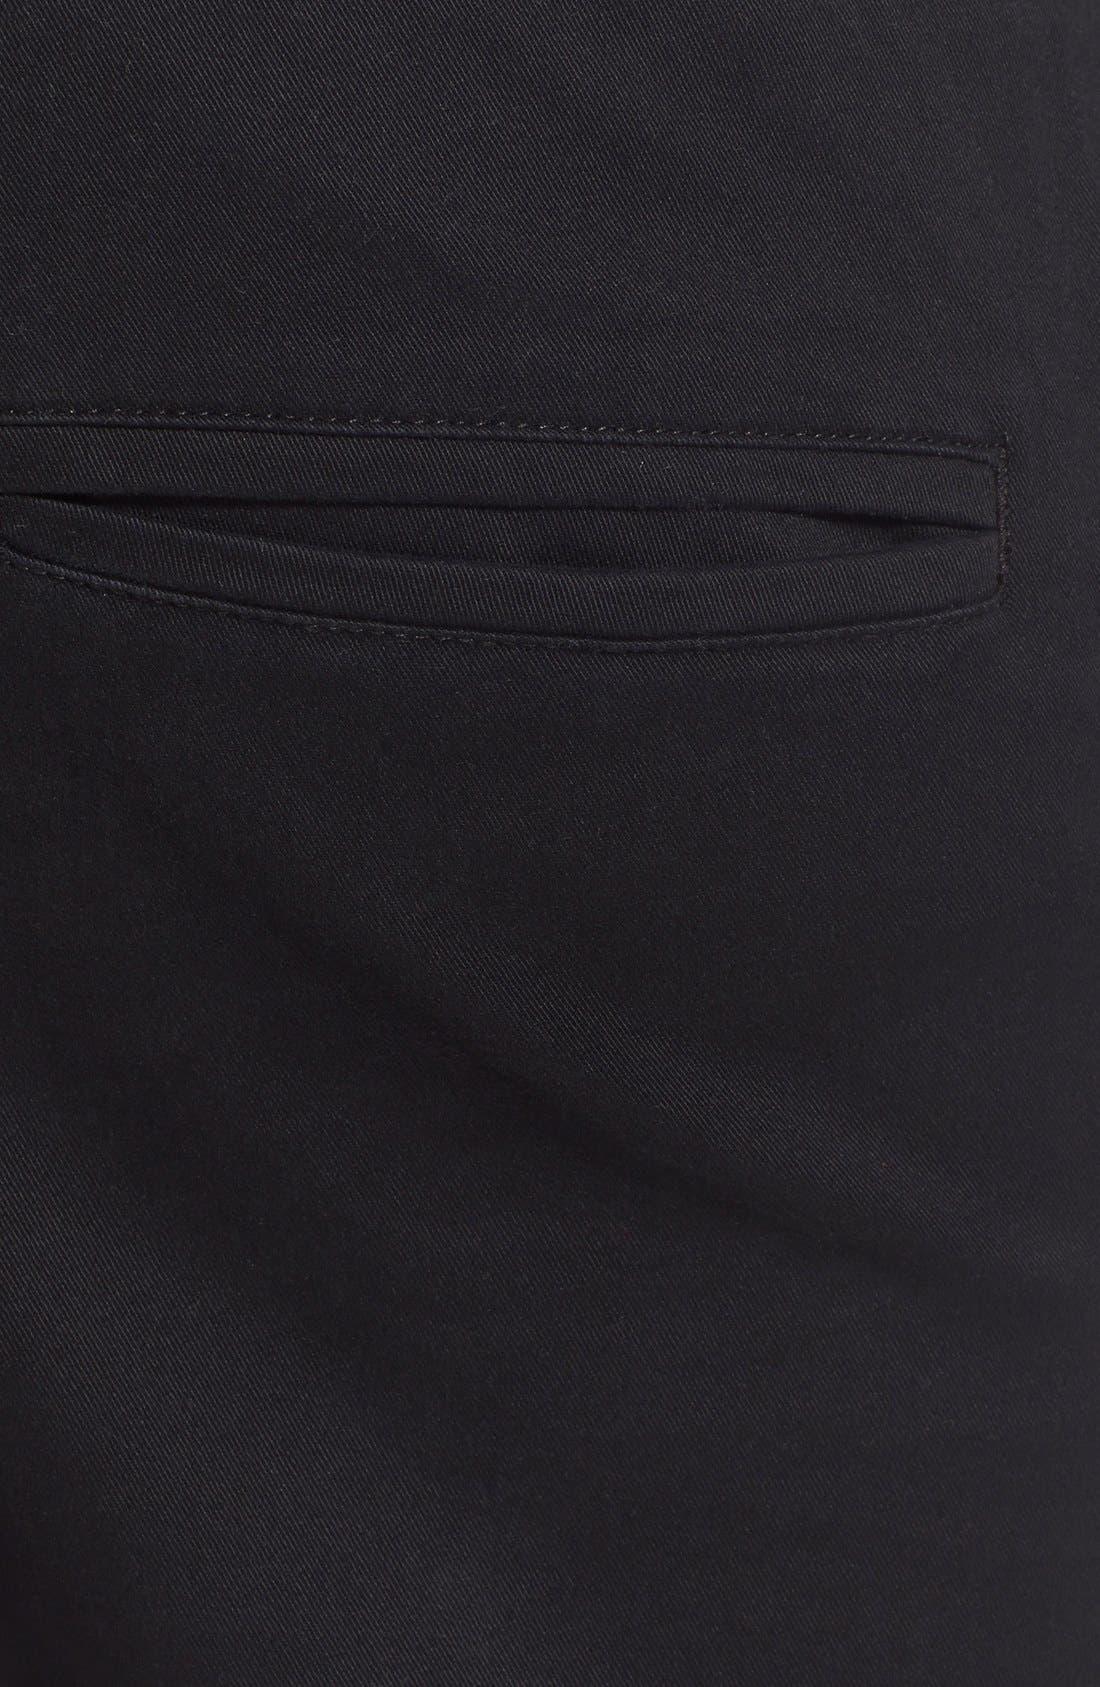 'Sureshot' Slim Tapered Leg Jogger Chinos,                             Alternate thumbnail 3, color,                             Black